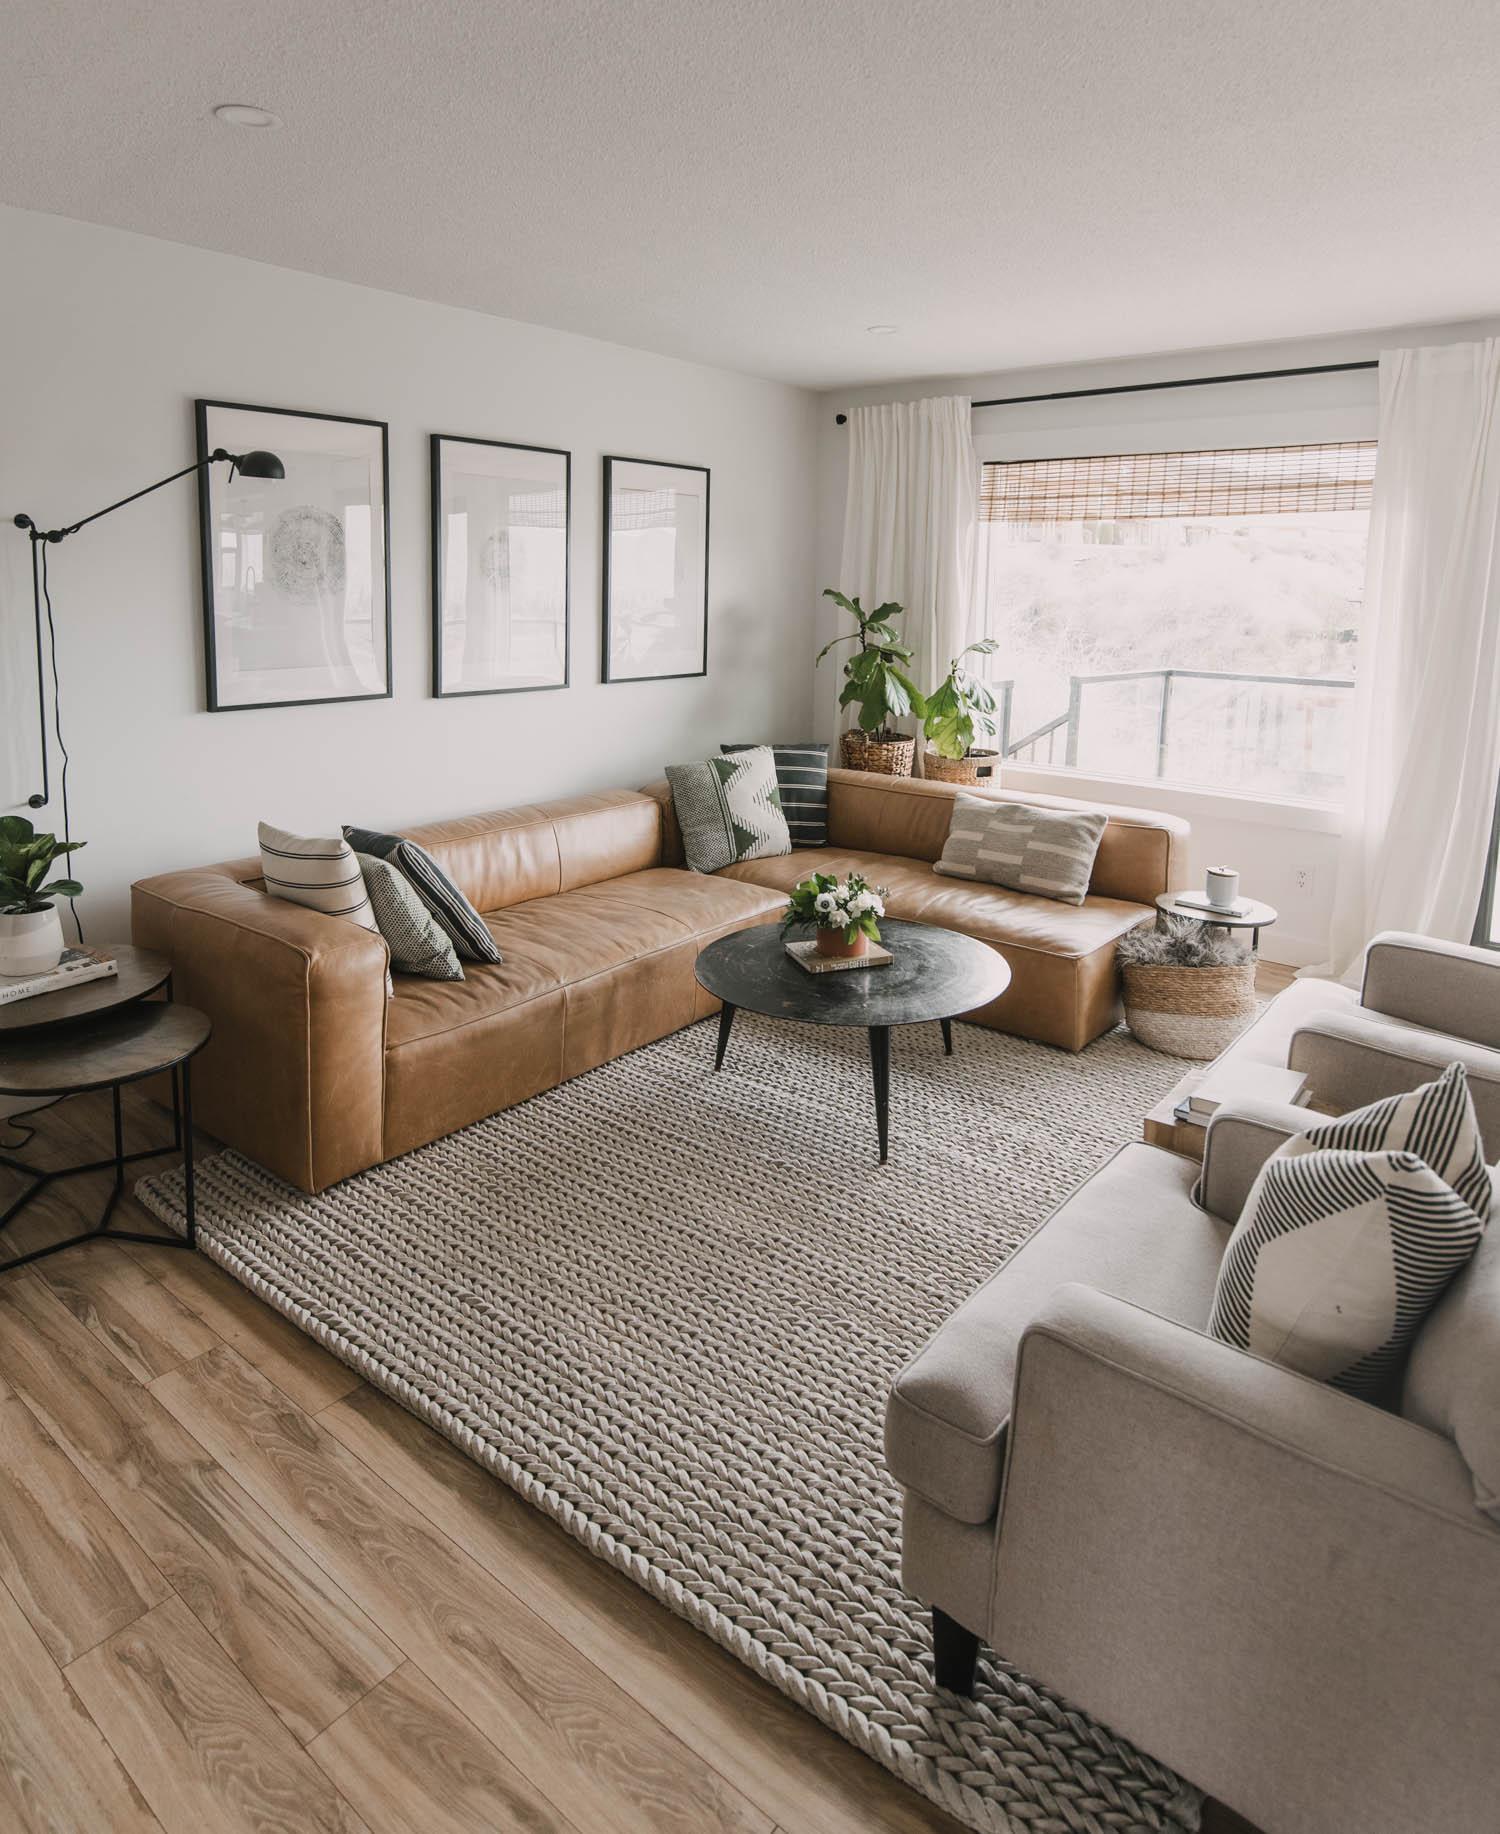 Modern decor for spring home tour